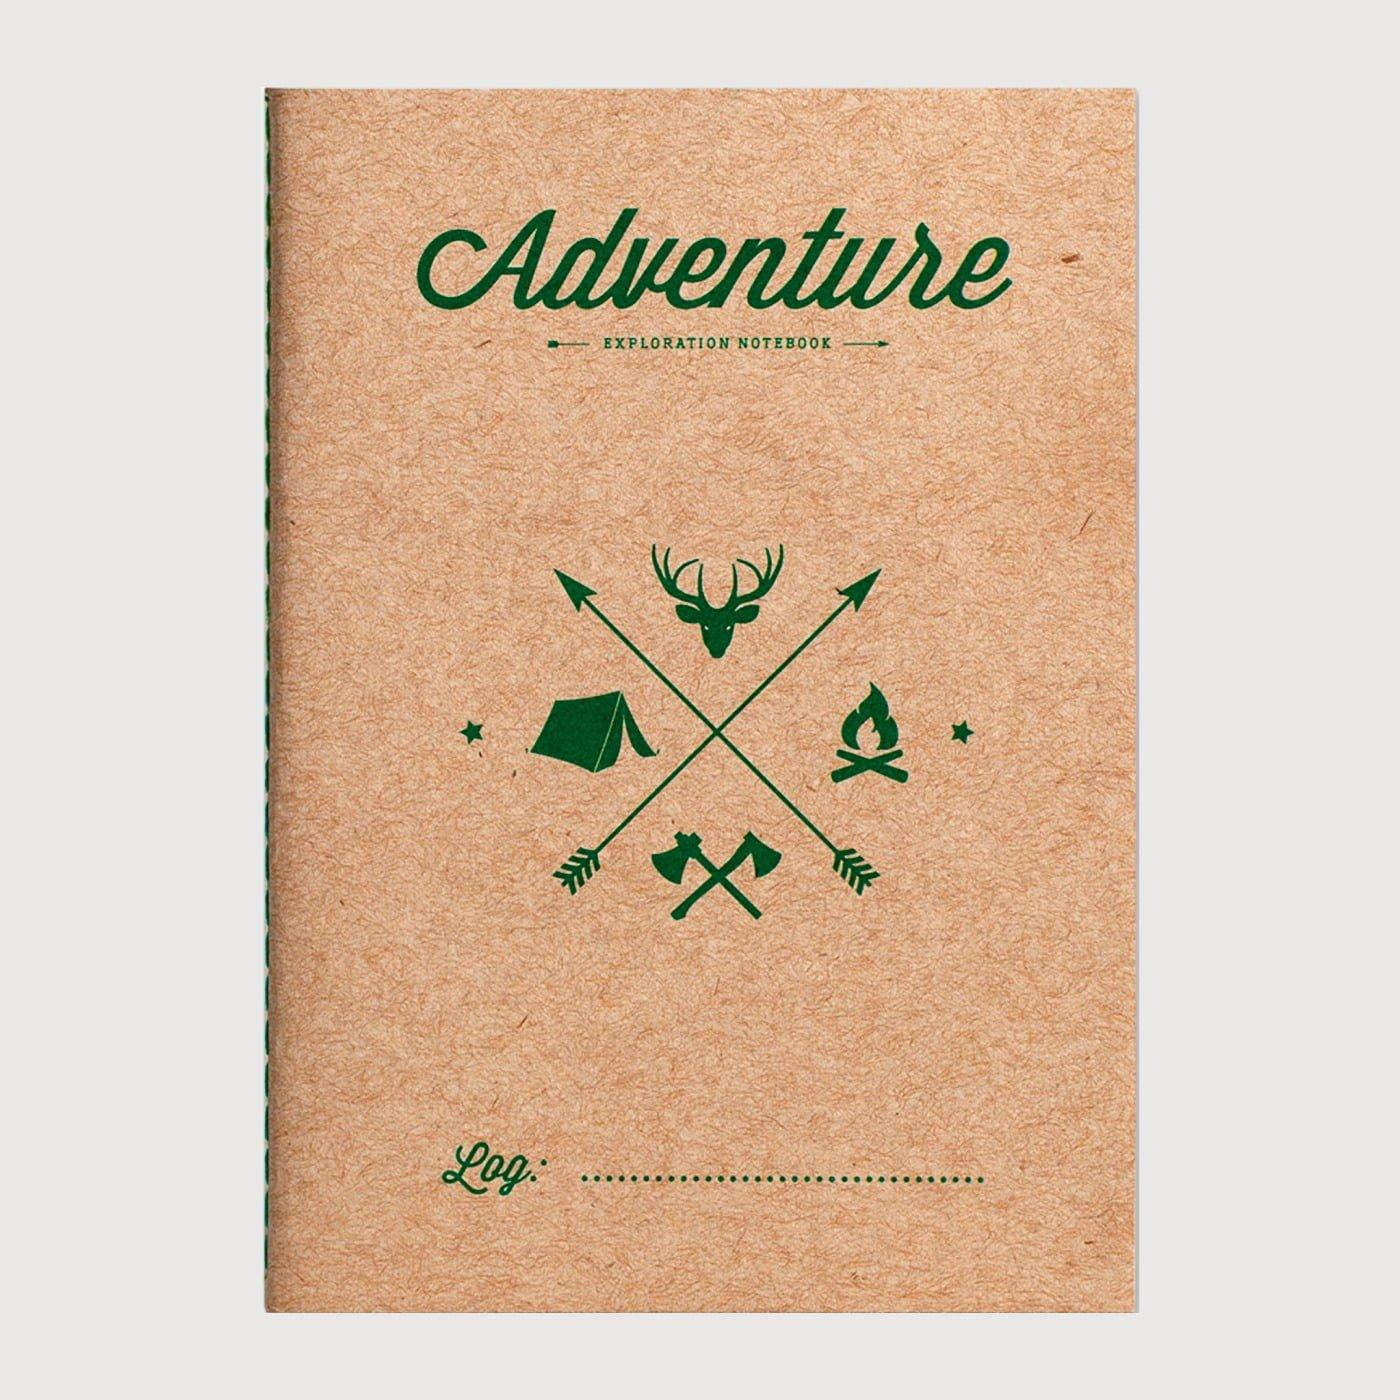 Adventure - Apaixonarte